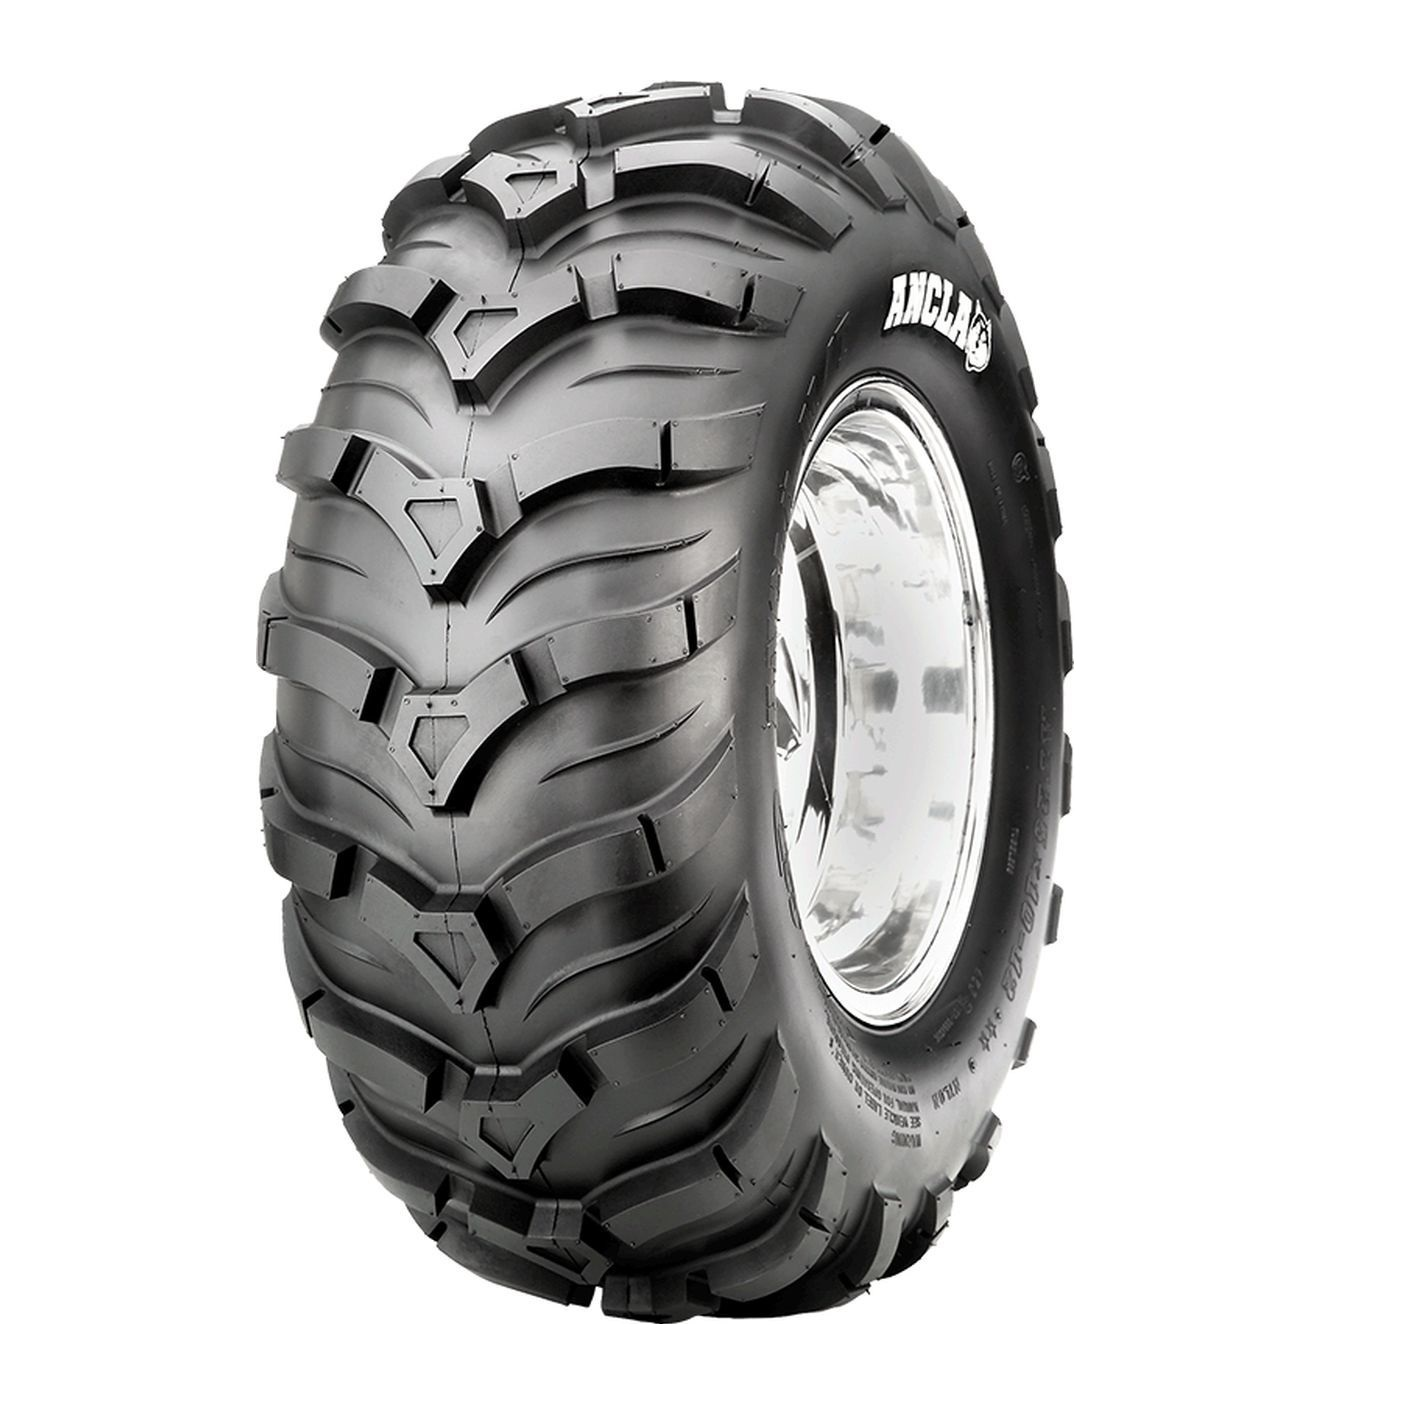 CST ANCLA pneumatika 26X11-12 4PR (57M)